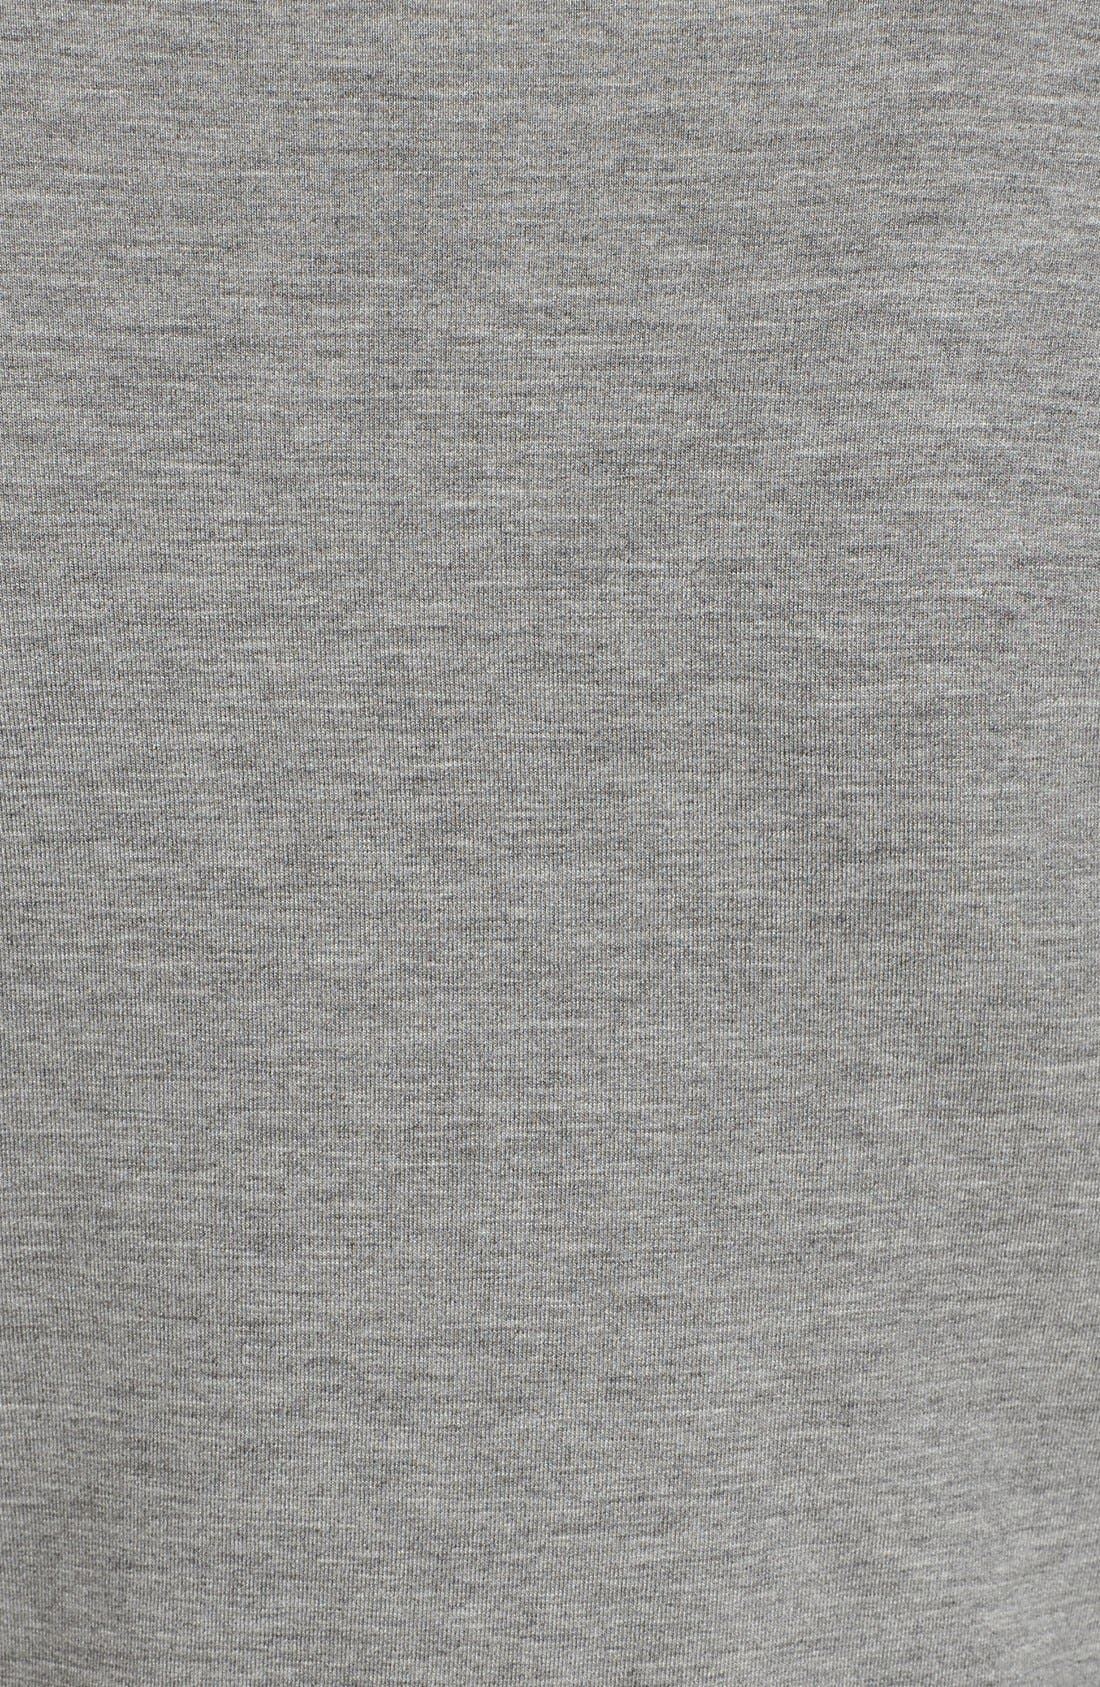 Long Sleeve Crewneck Top,                             Alternate thumbnail 32, color,